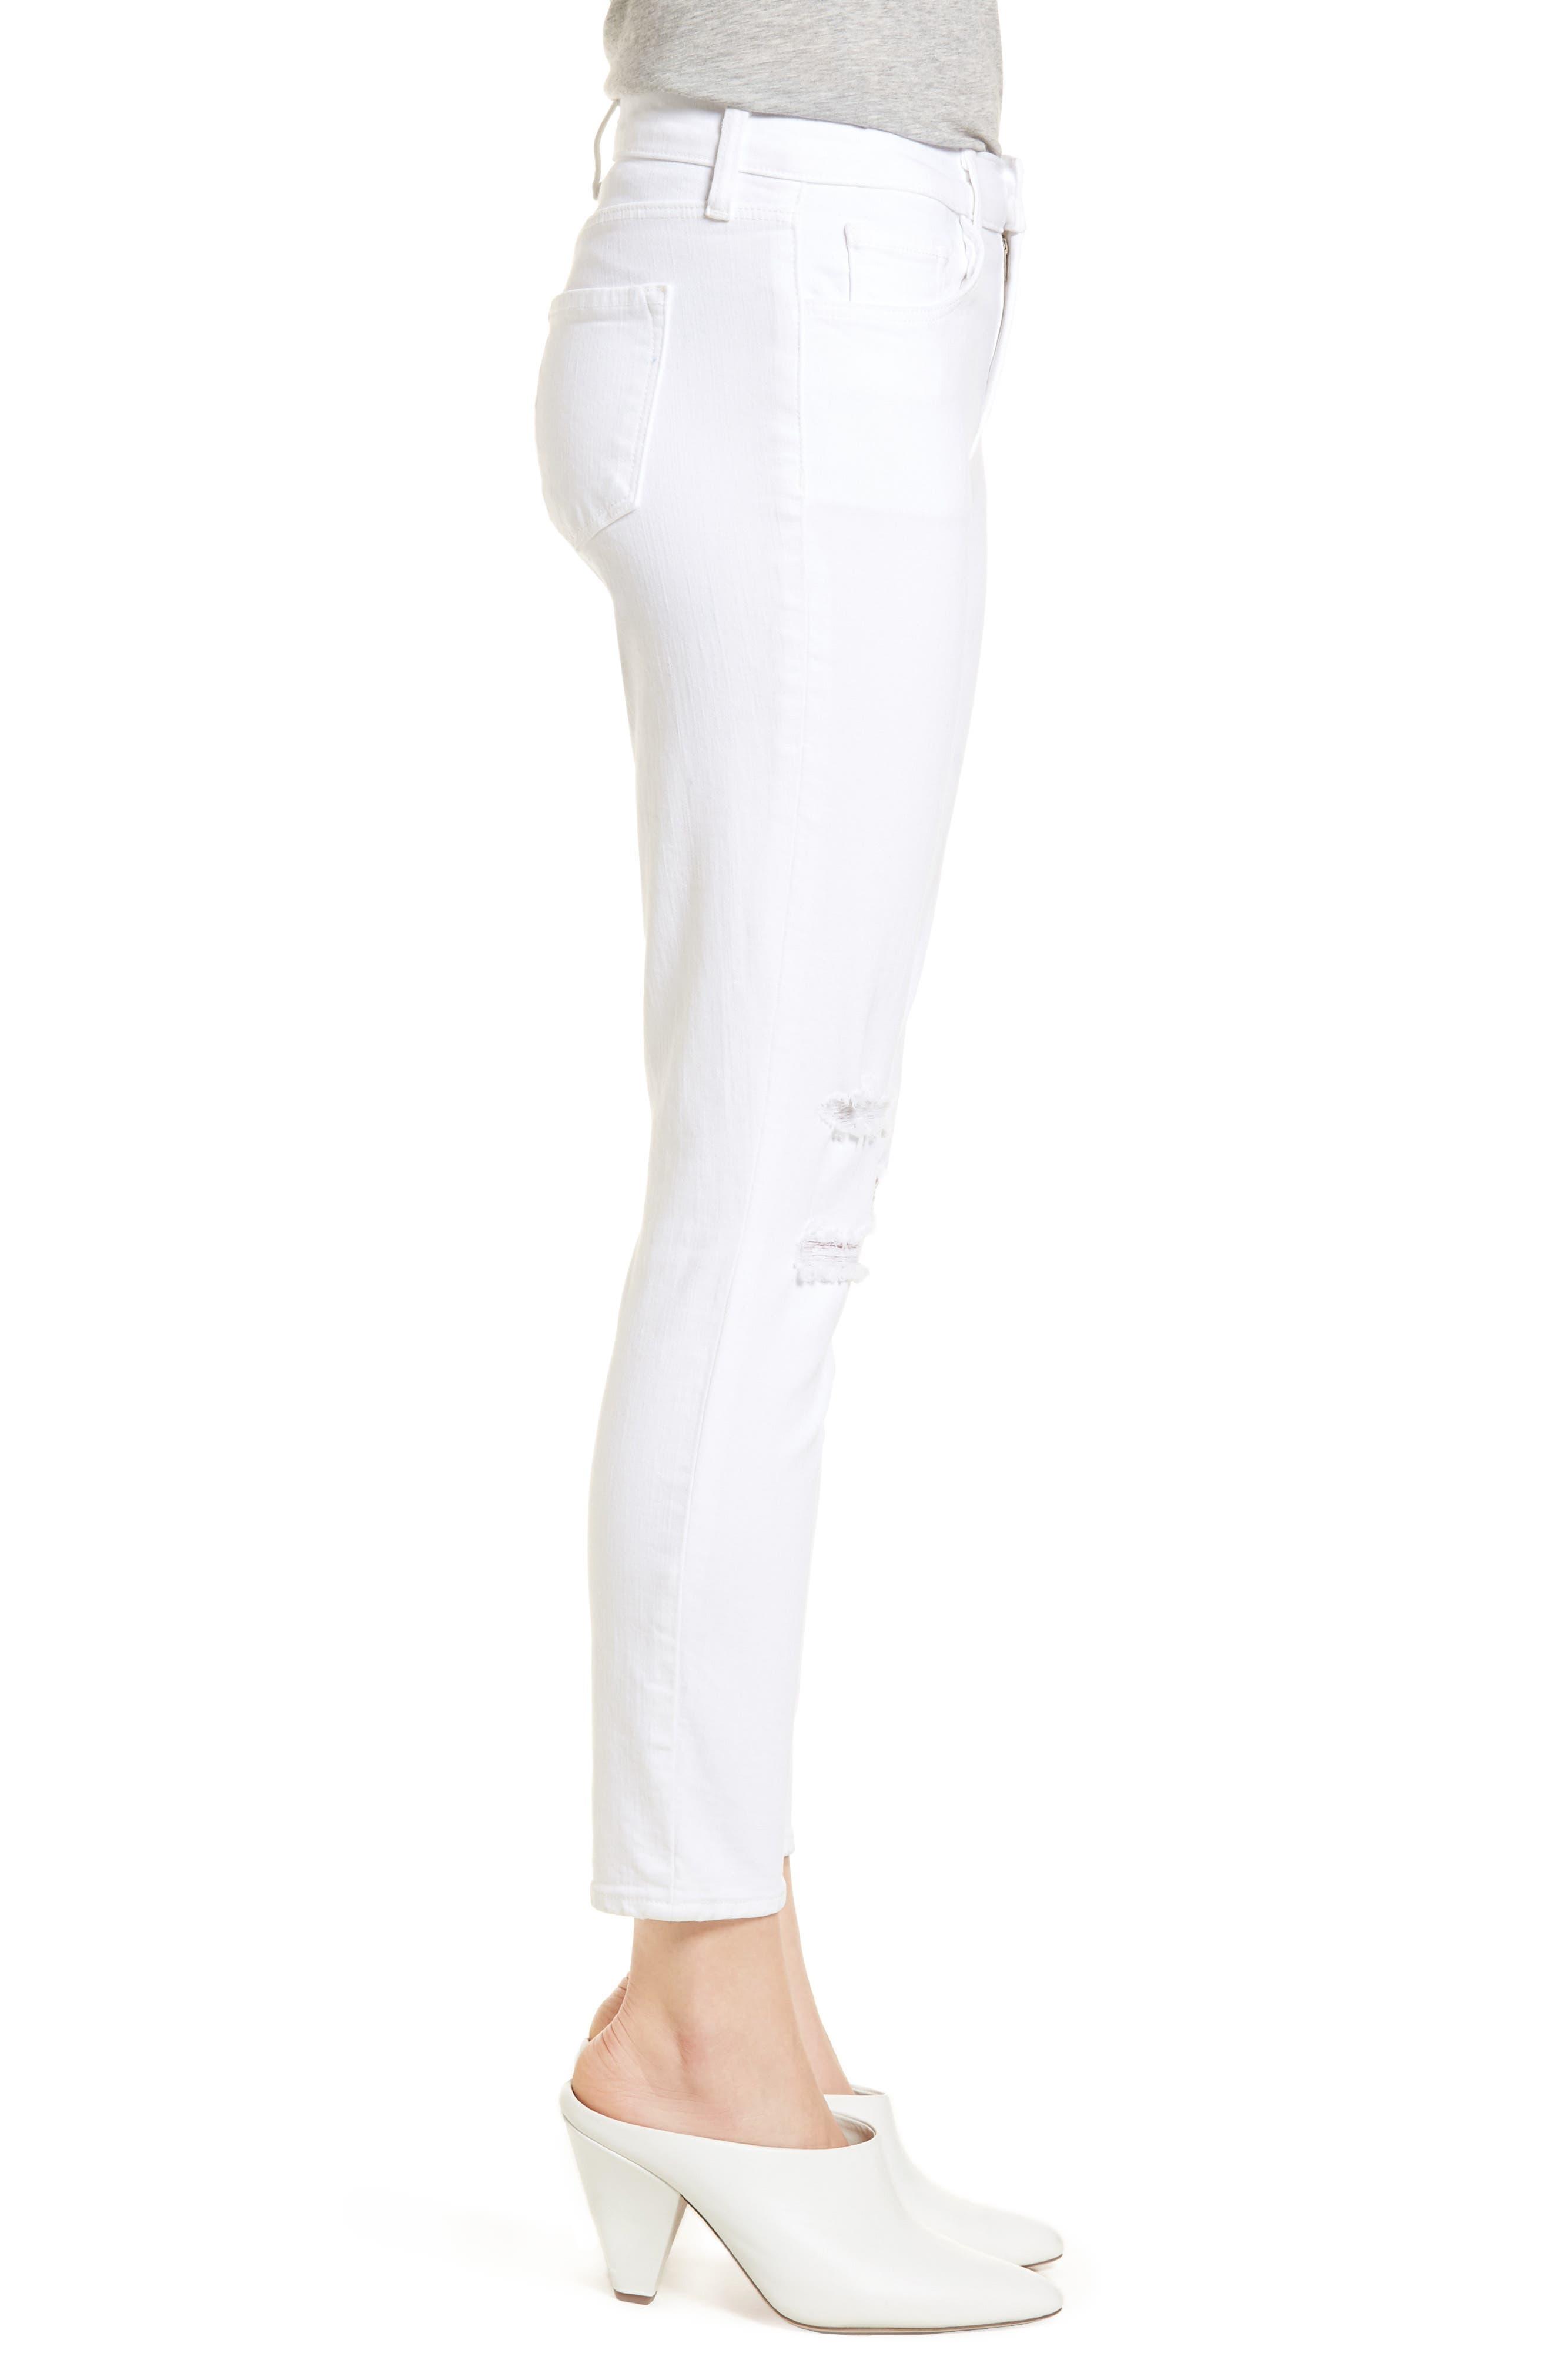 Mid-Rise Capri Skinny Jeans,                             Alternate thumbnail 3, color,                             White Mercy